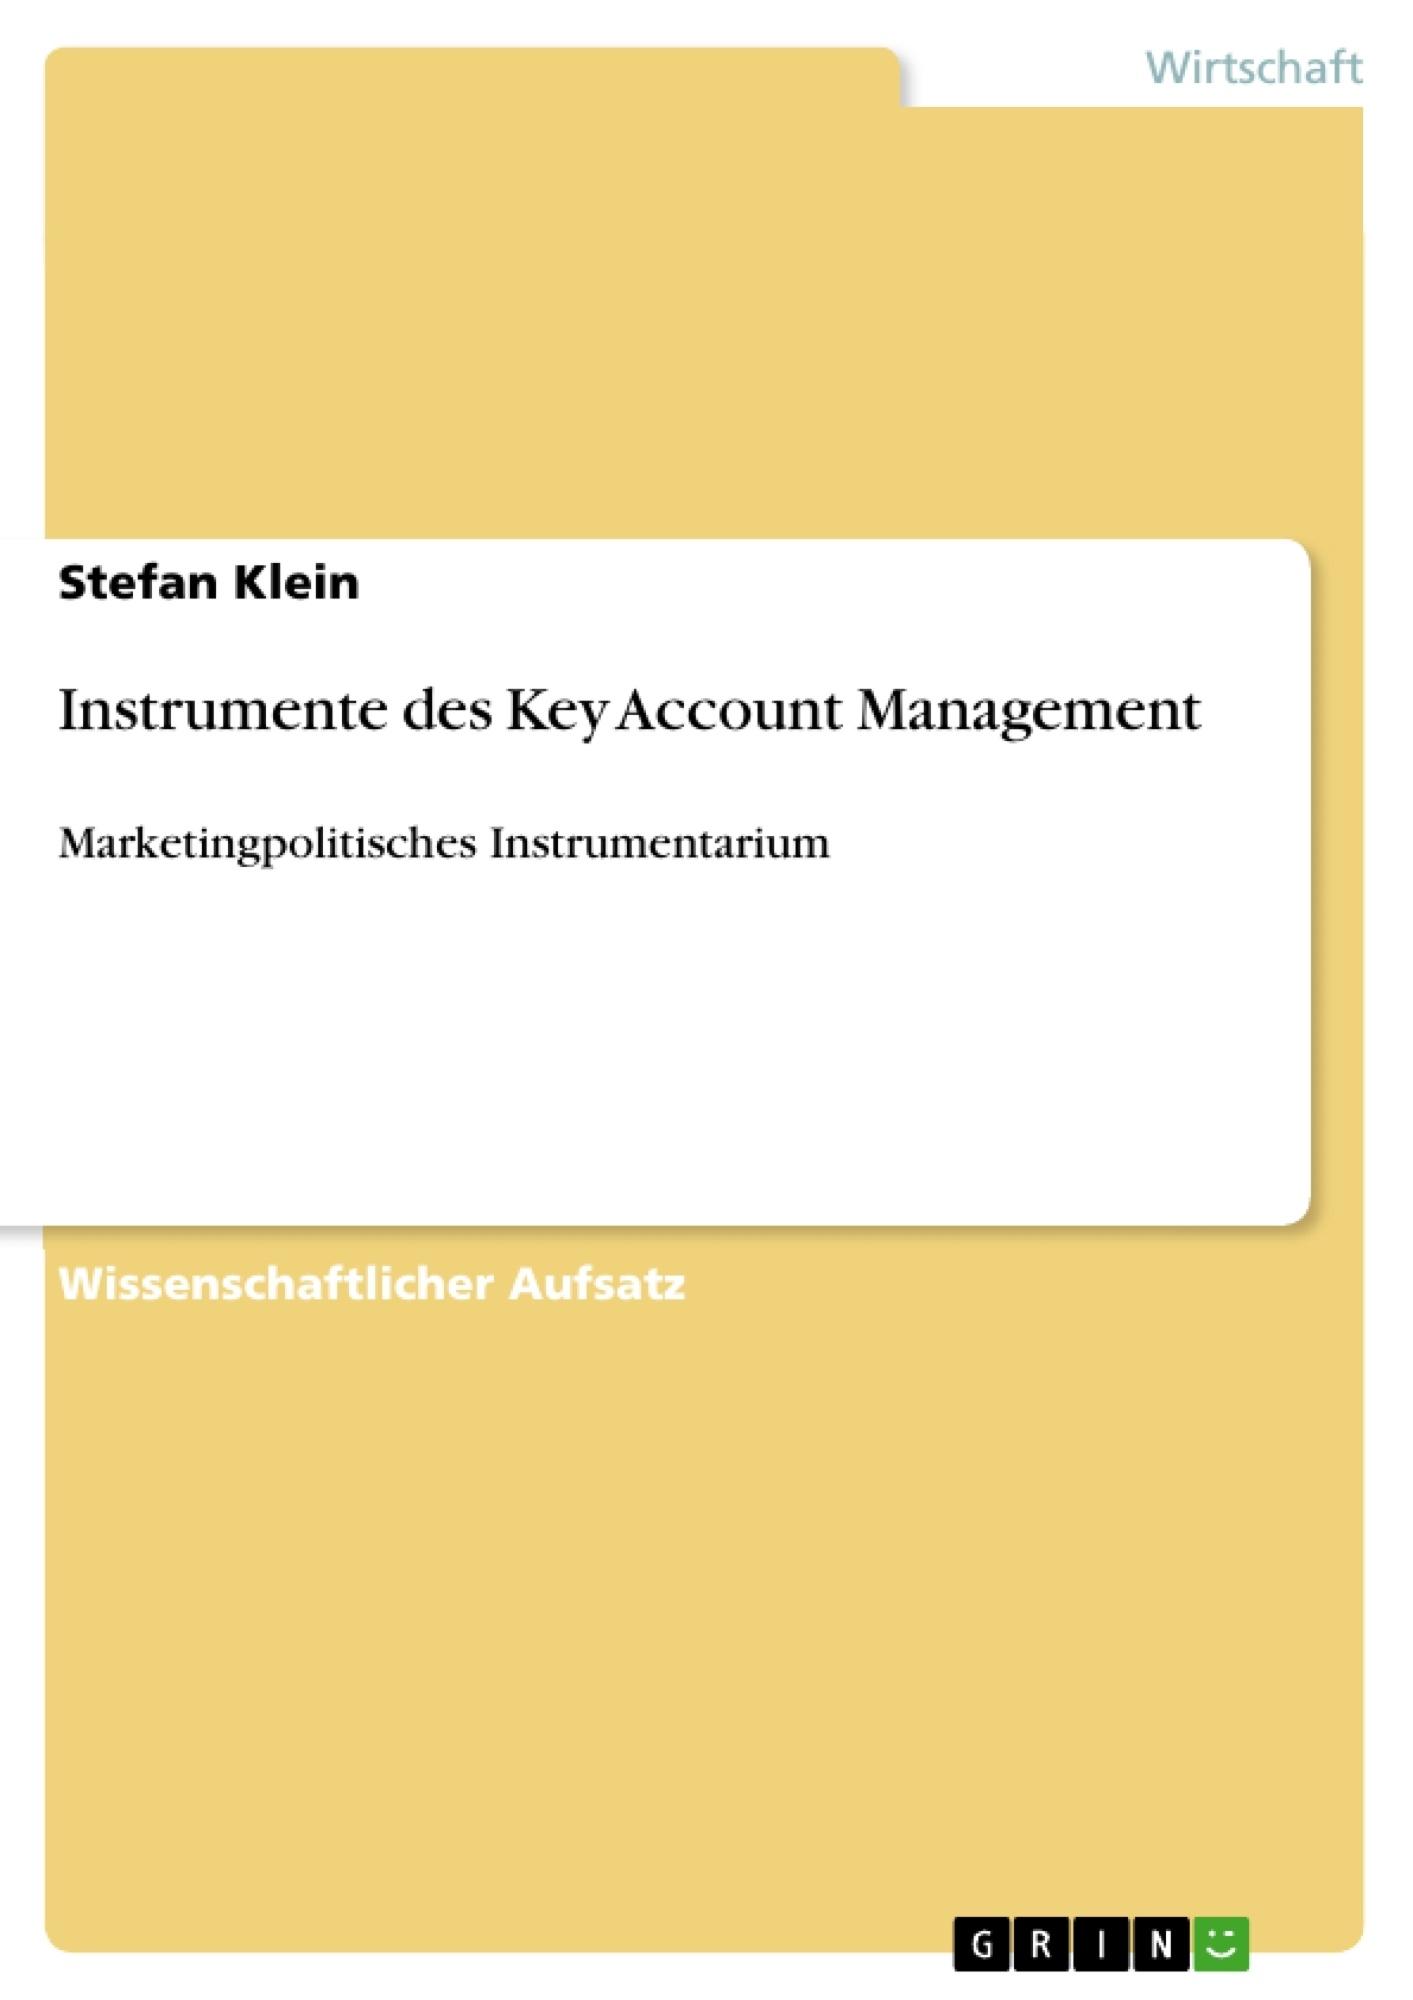 Titel: Instrumente des Key Account Management